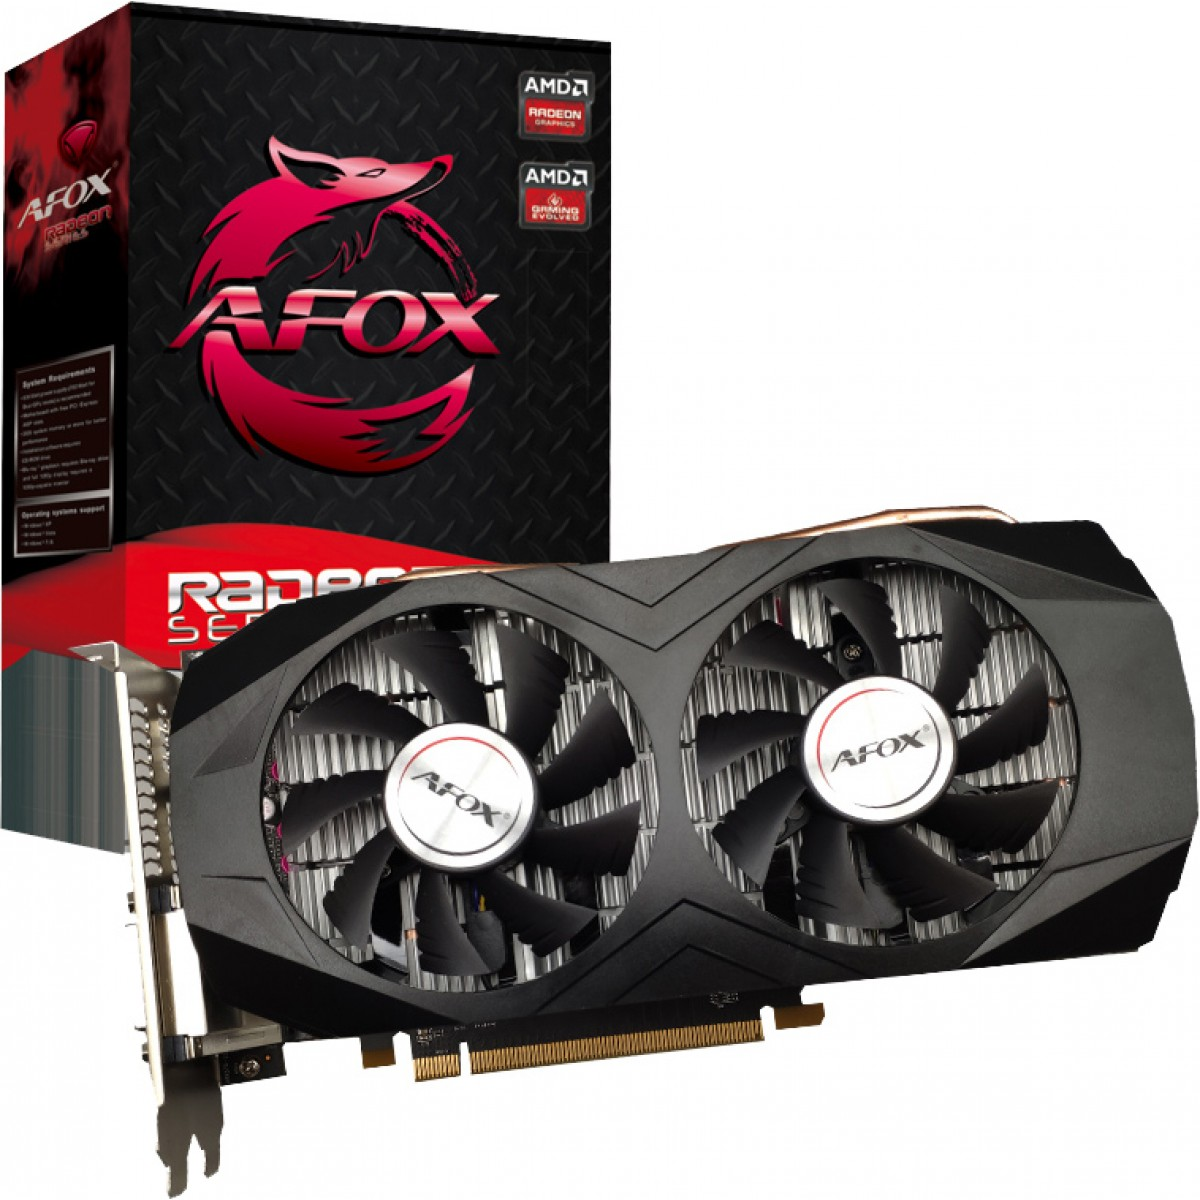 Placa de Vídeo Radeon RX 580 8GB GDDR5, 256Bit, Dual Fan, AFRX580-8192D5H5